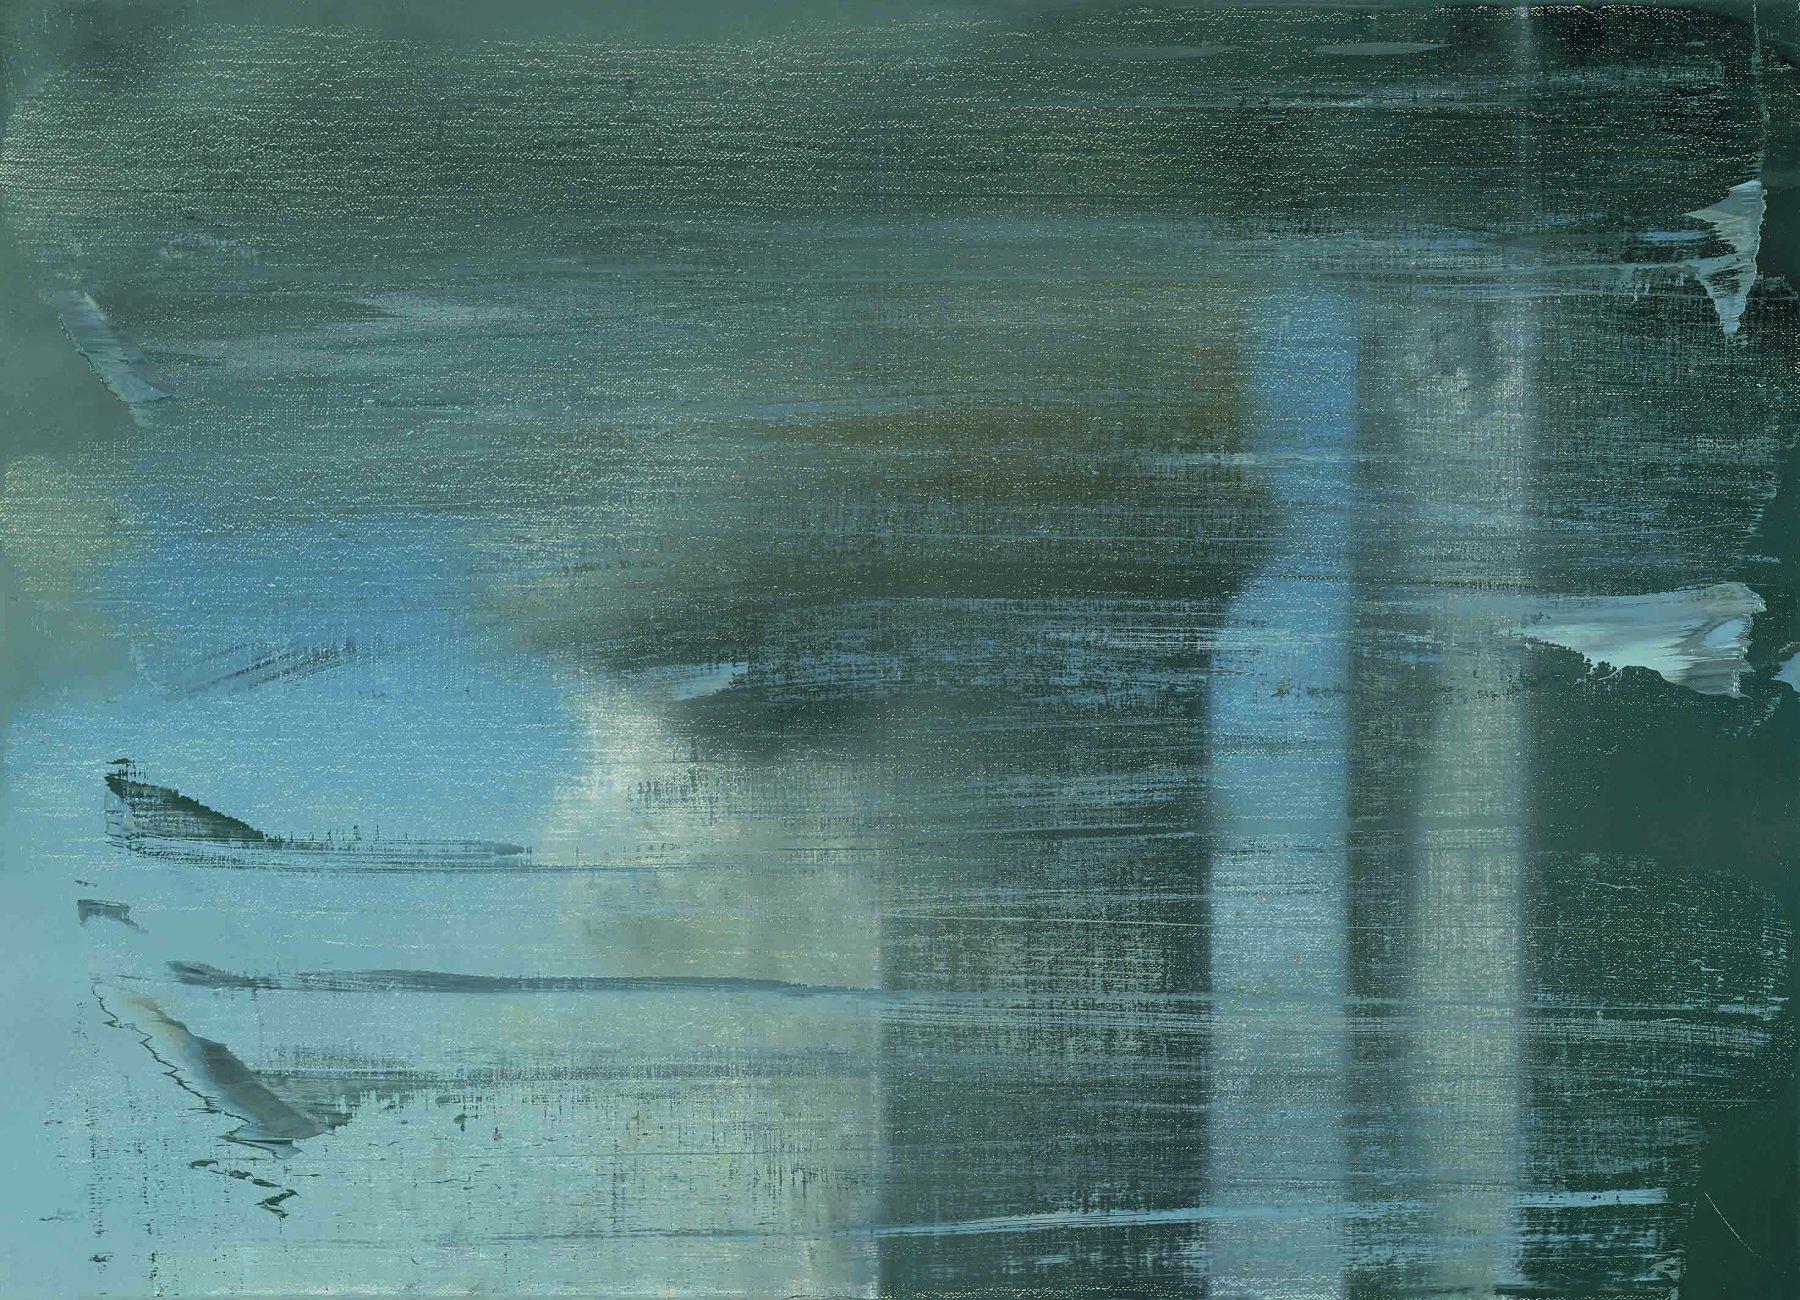 gerhard richter painting125_p_891_5.jpg